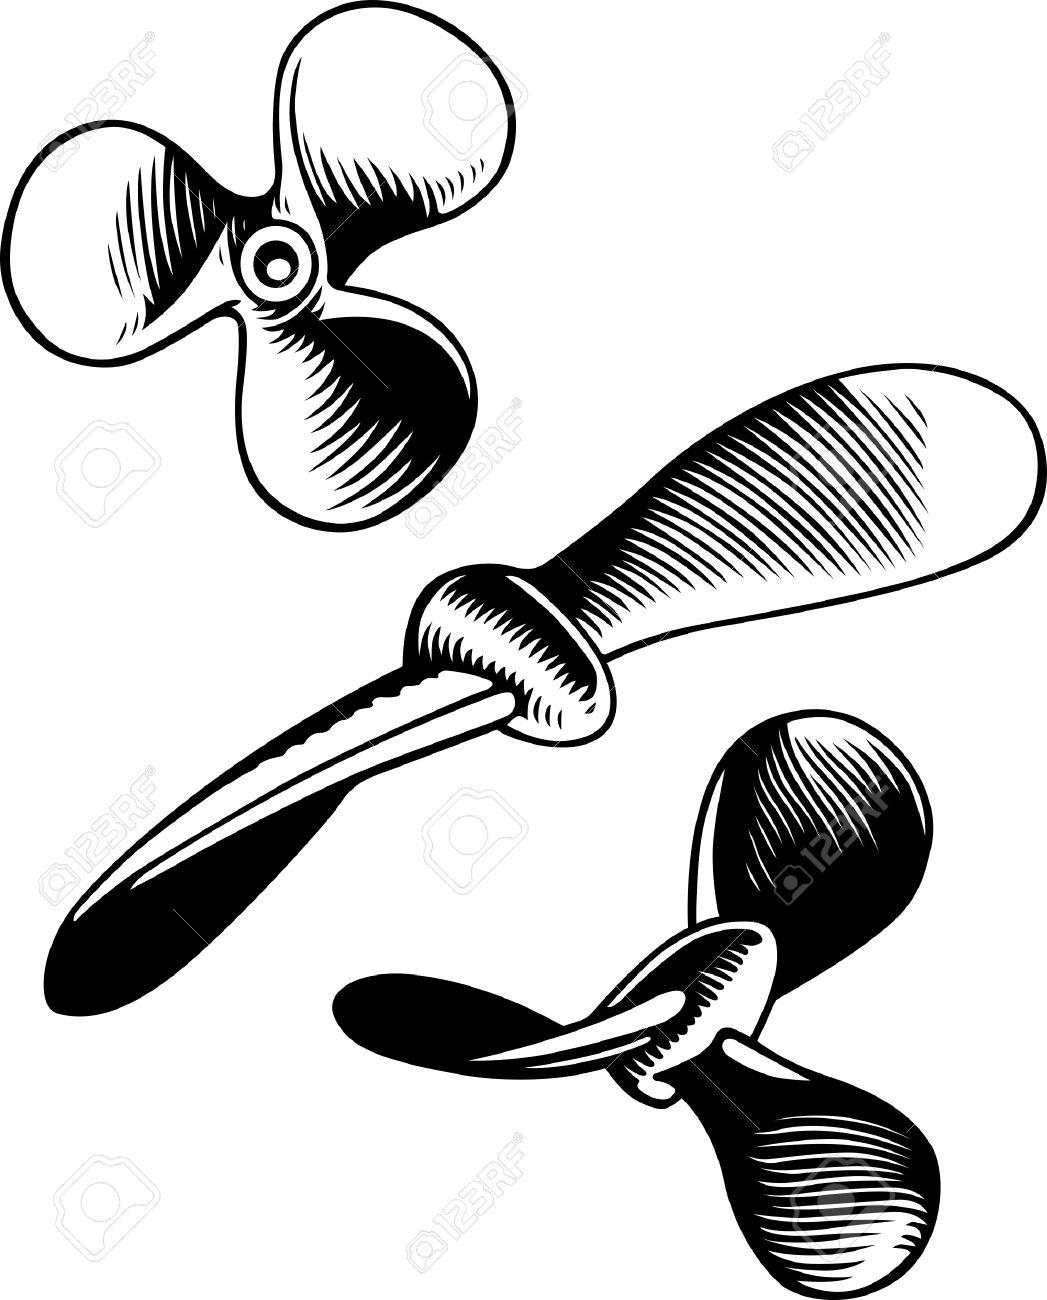 Five Blade Propeller Clip Art : Propeller clipart clipground